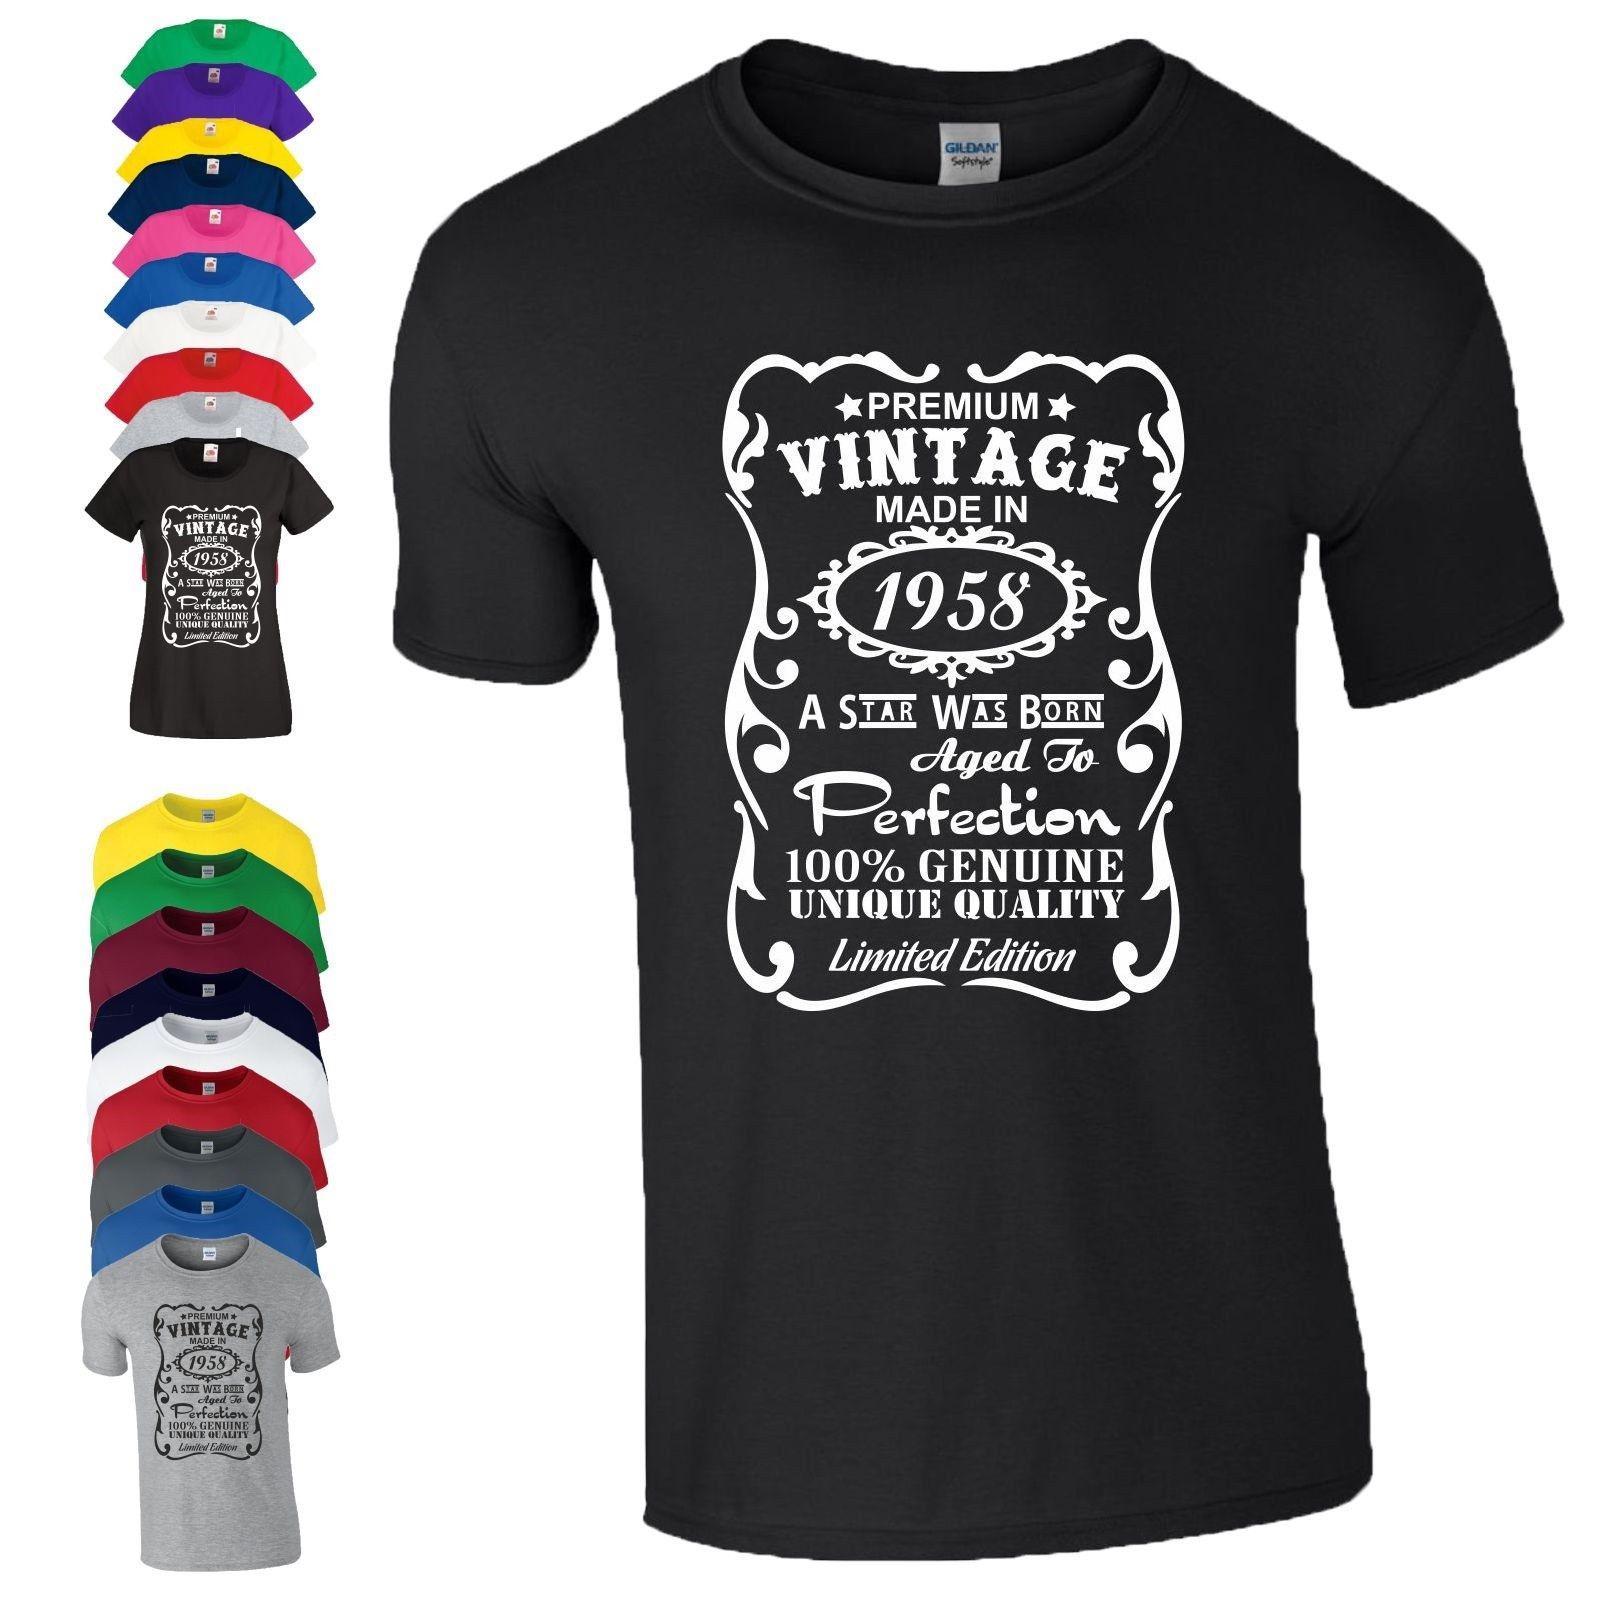 Grosshandel 60 Geburtstag Geschenk T Shirt Made In 1958 Vintage Star